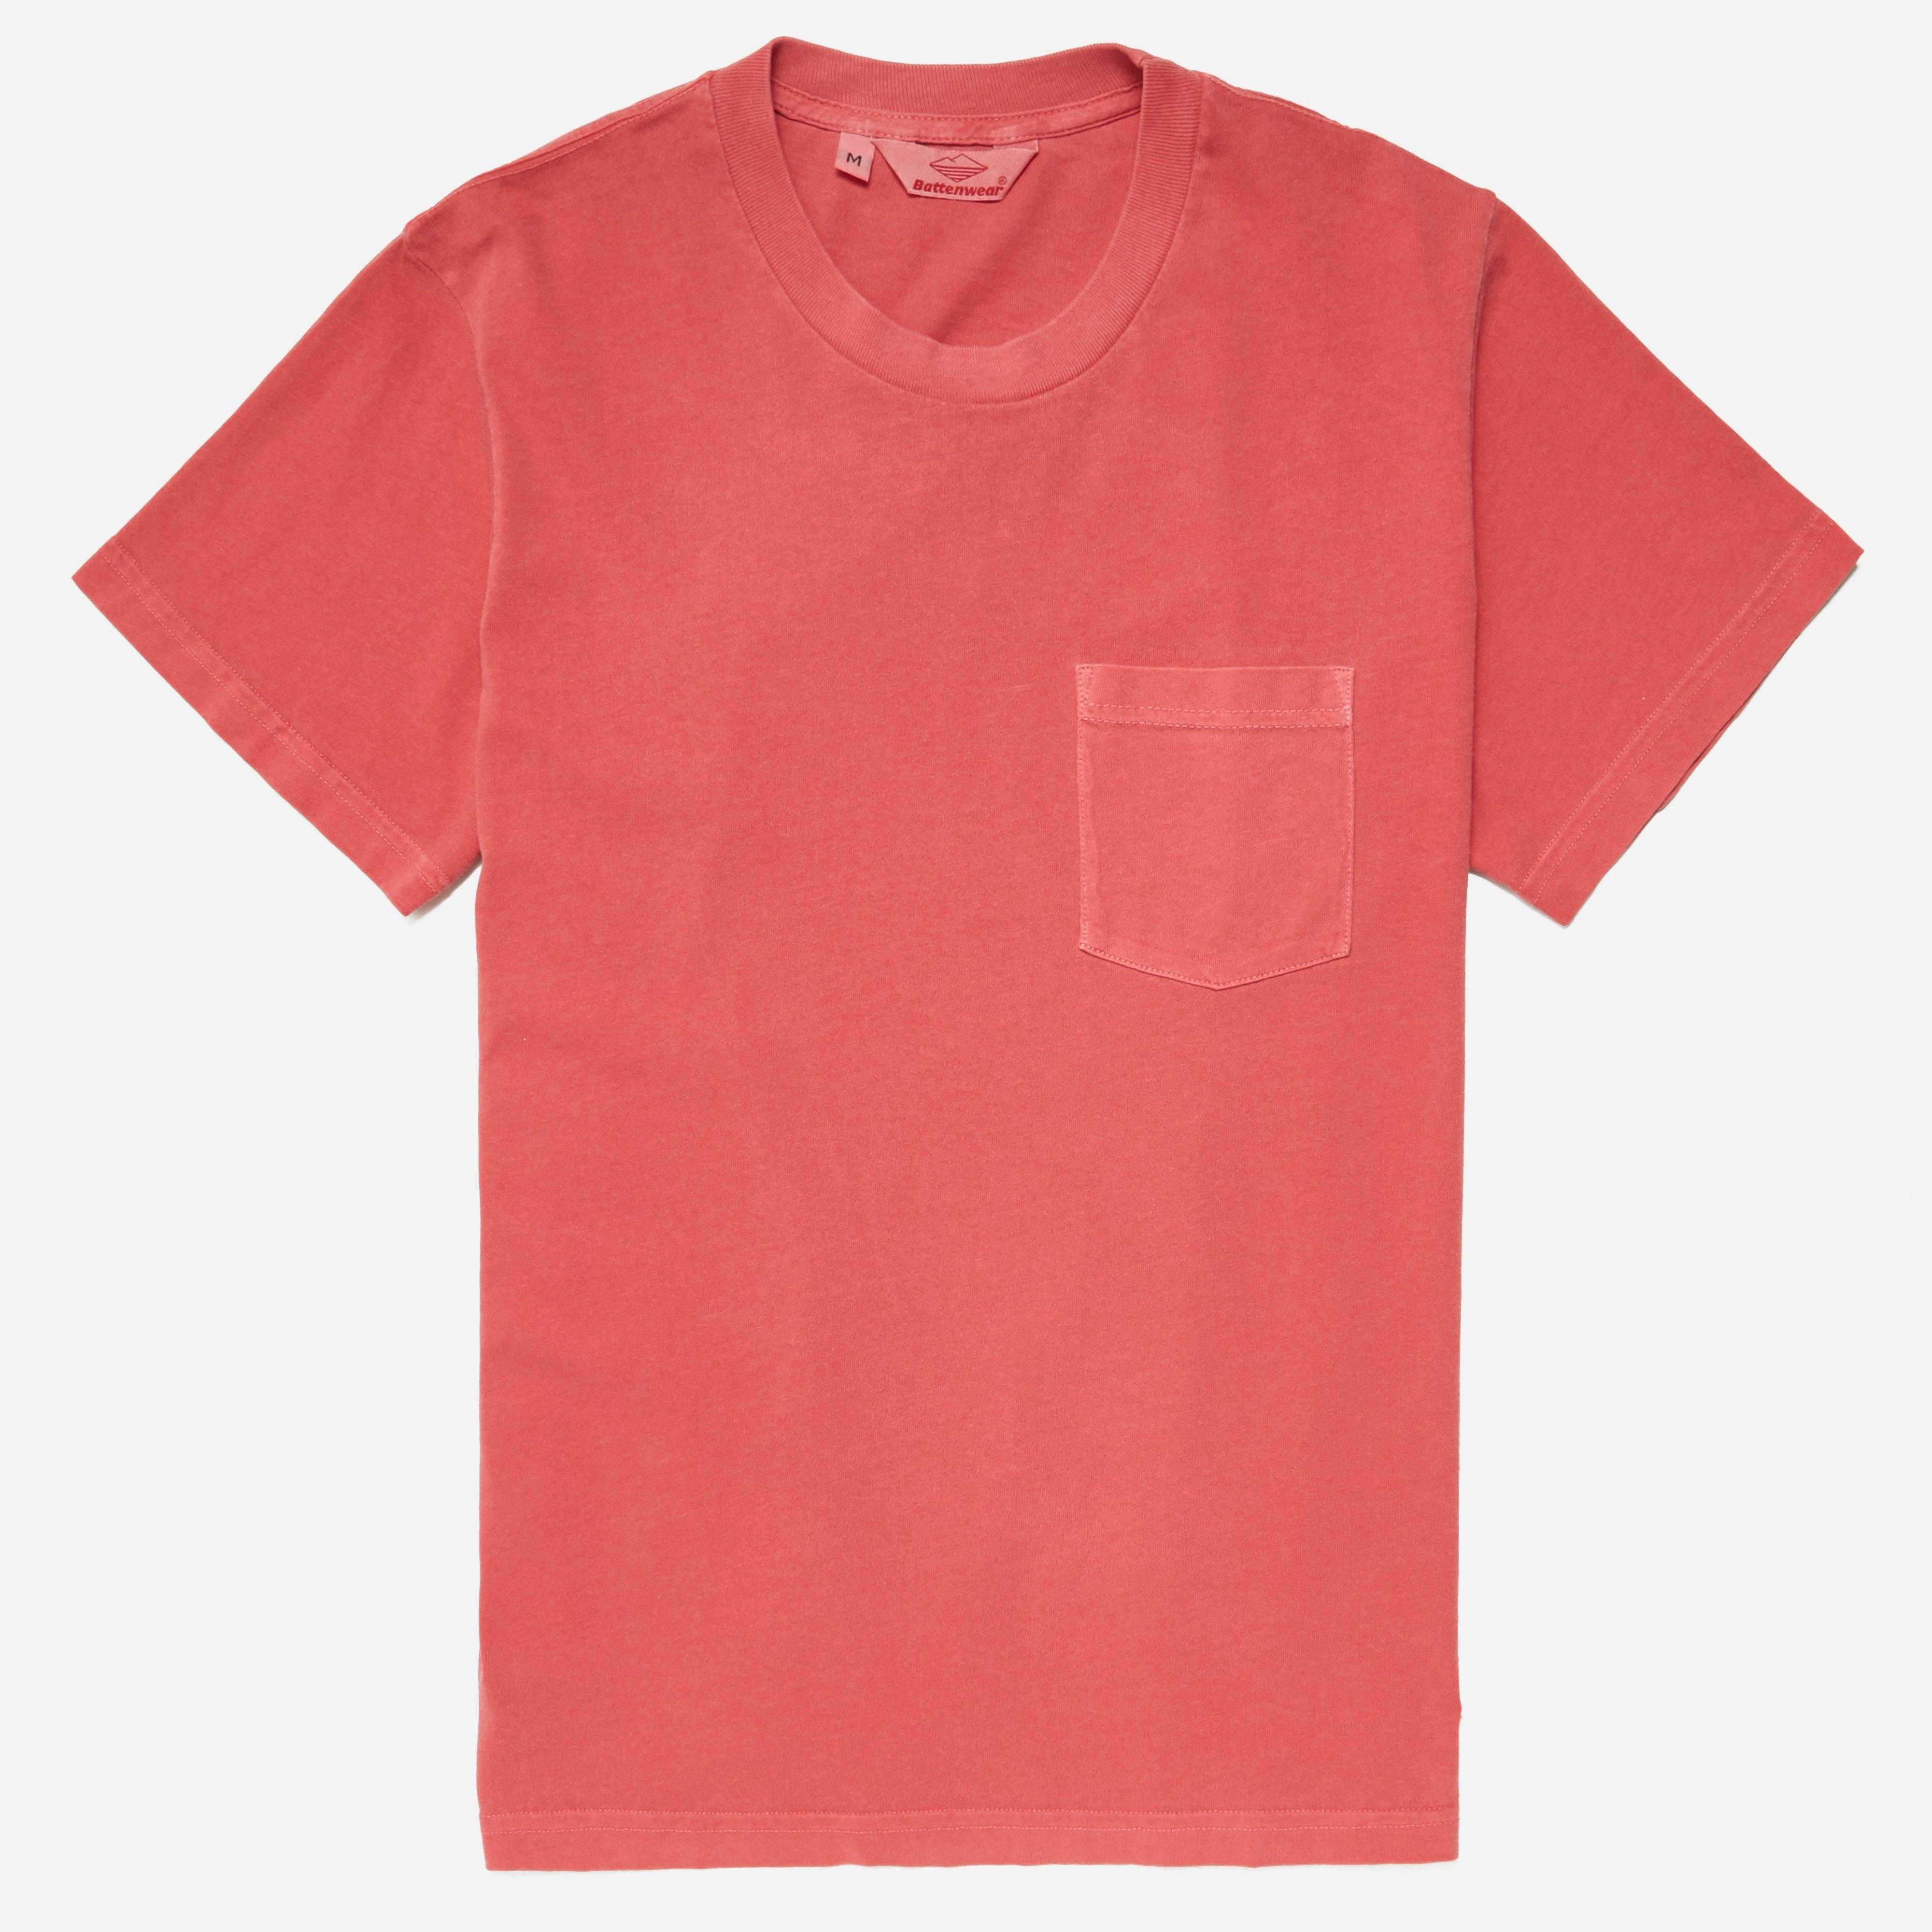 Battenwear Pocket T-shirt